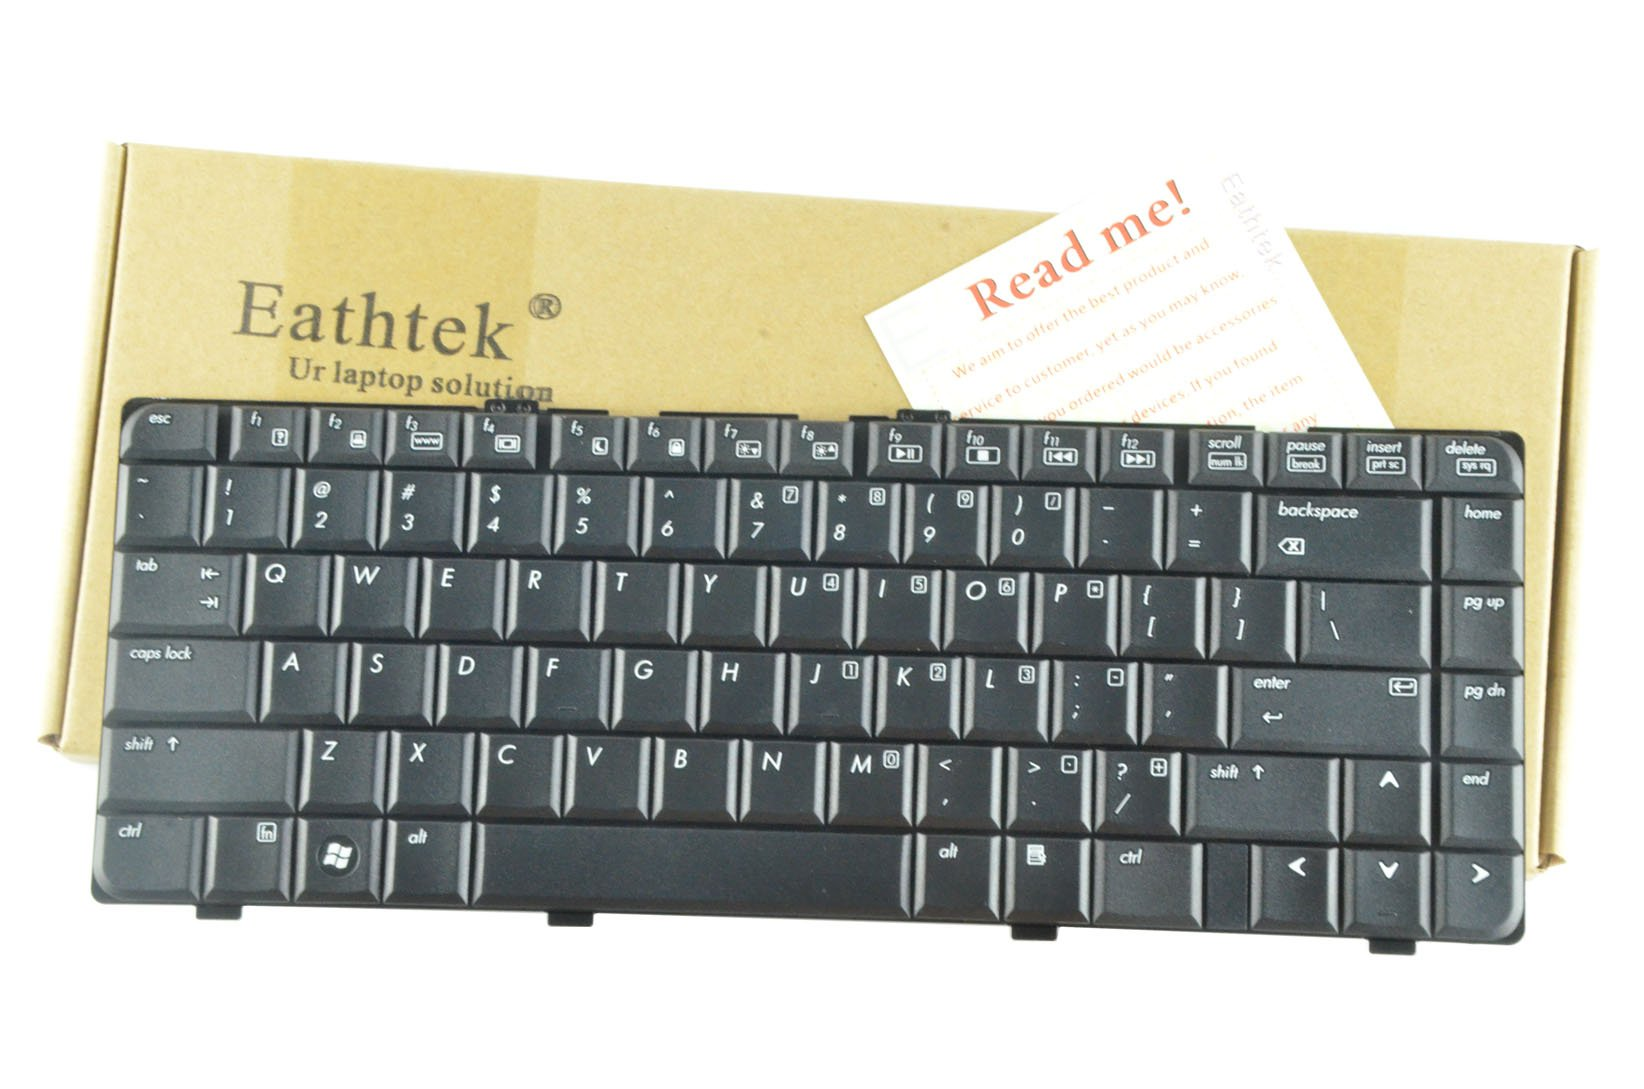 Eathtek Replacement Keyboard for HP Pavilion DV6000 DV6100 DV6200 Black US Layout, Compatible Part Number 431414-001,431415-001,431416-001